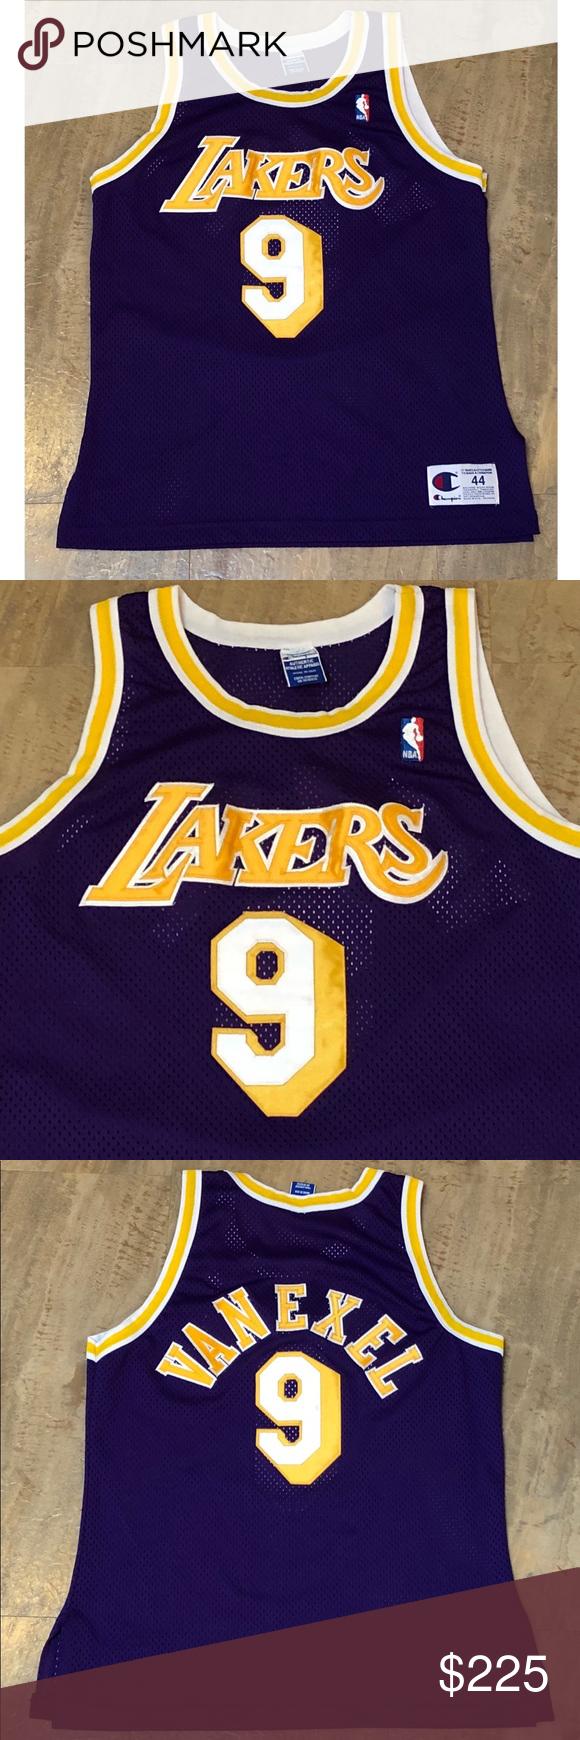 f8e872727 Champion Authentic LA Lakers Nick Van Exel Jersey Vintage Champion Nick Van  Exel Los Angeles Lakers